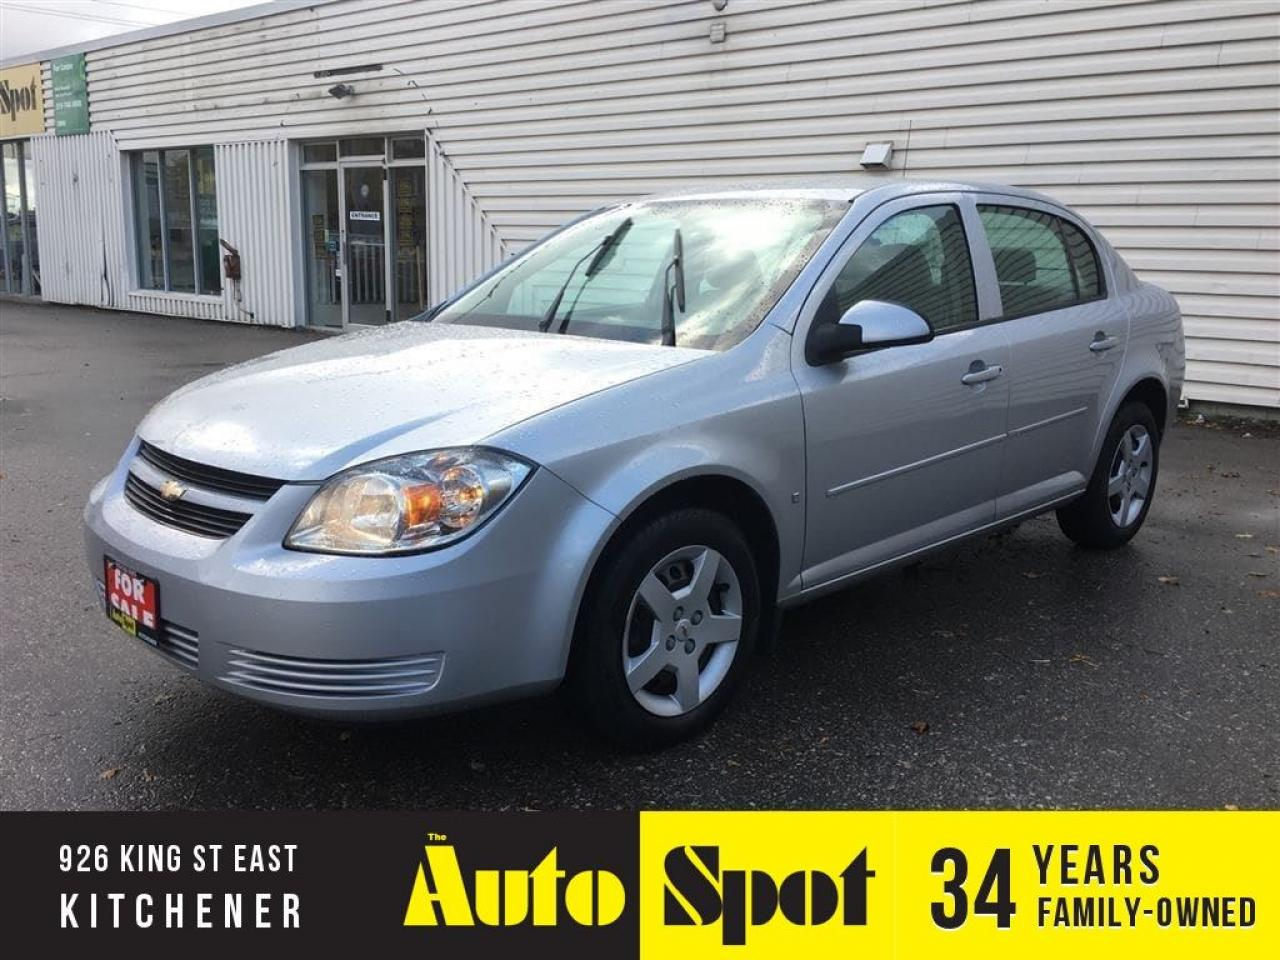 2008 Chevrolet Cobalt LT /LOW, LOW KMS!/CAR IS PRISTINE!